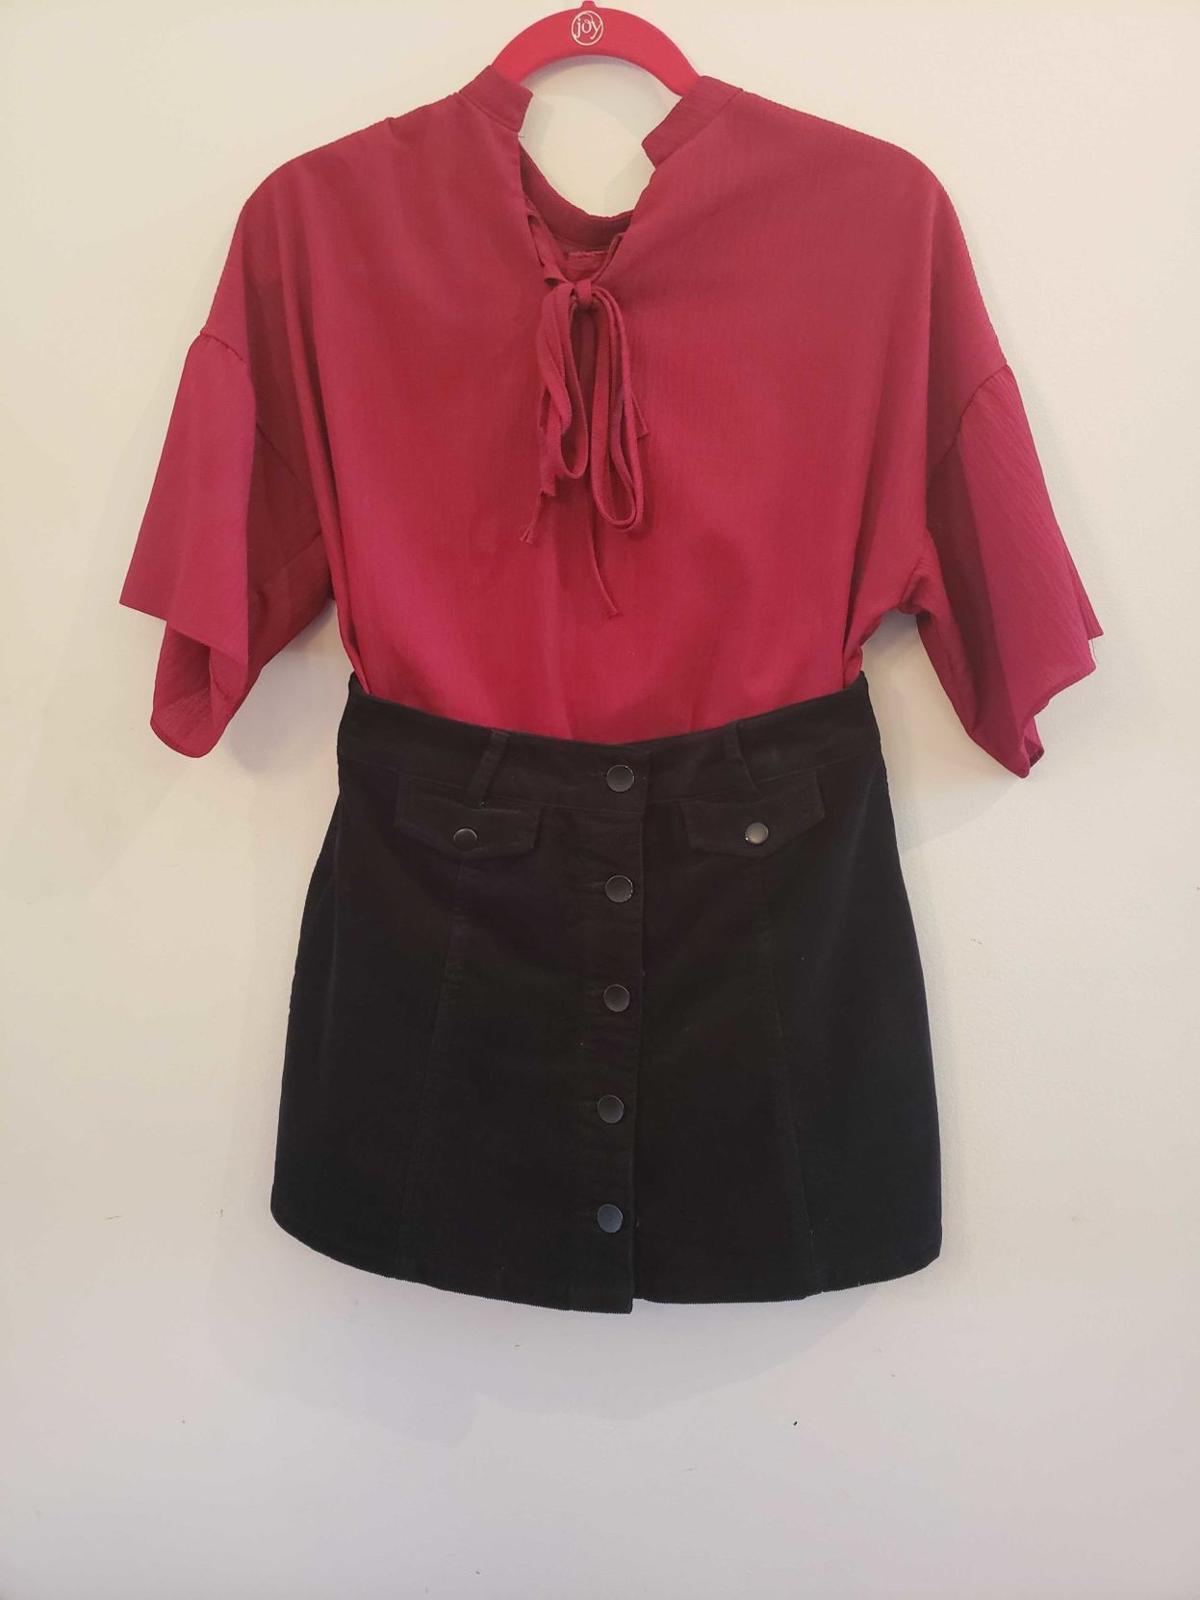 A tied blouse and corduroy skirt hang on display